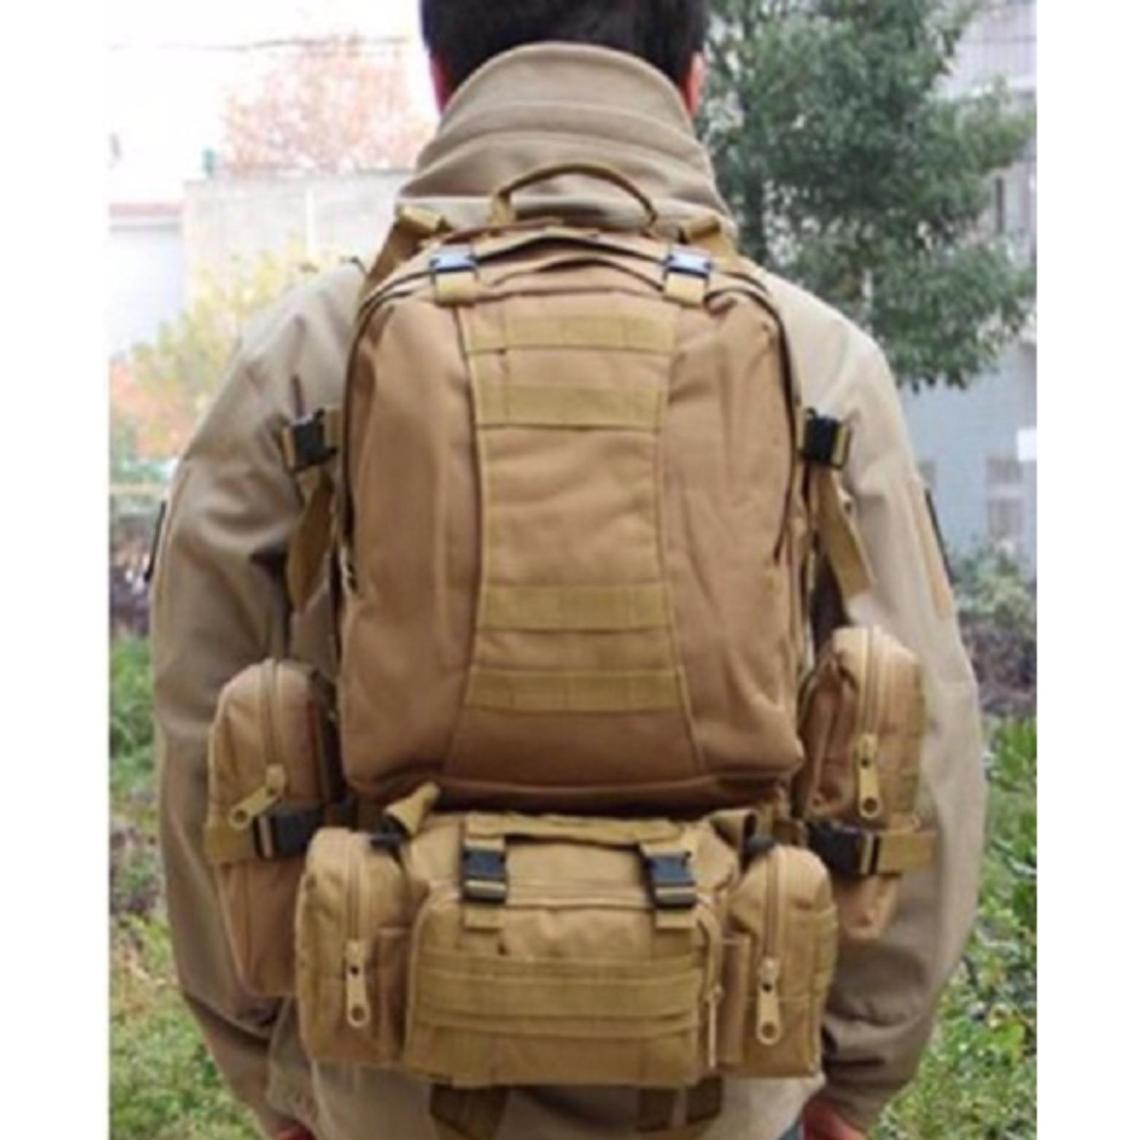 24l Army Bags - tas-ransel-tentara-army-travel-hiking-bag-24l-multifungsi-[brown]-+-free-jam-tangan-pria-swiss-army-1234-12369073-5a952112cb95c88e32548a5818e3ee21_Best 24l Army Bags - tas-ransel-tentara-army-travel-hiking-bag-24l-multifungsi-[brown]-+-free-jam-tangan-pria-swiss-army-1234-12369073-5a952112cb95c88e32548a5818e3ee21  Pictures_996957.jpg